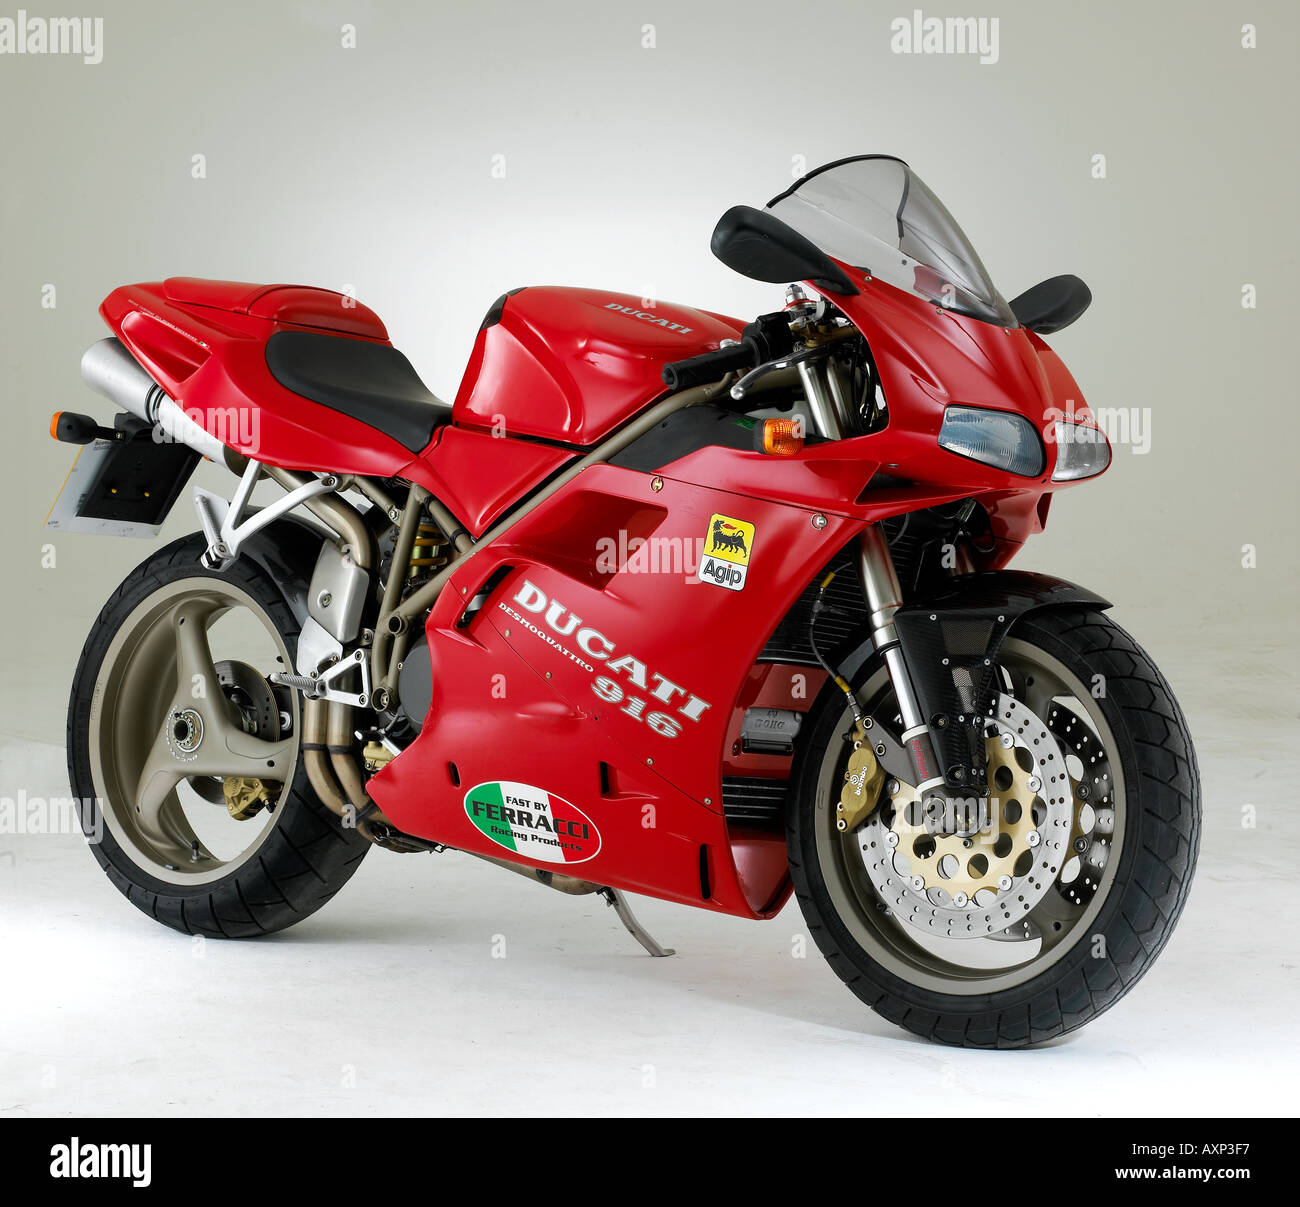 1995 Ducati 916 - Stock Image